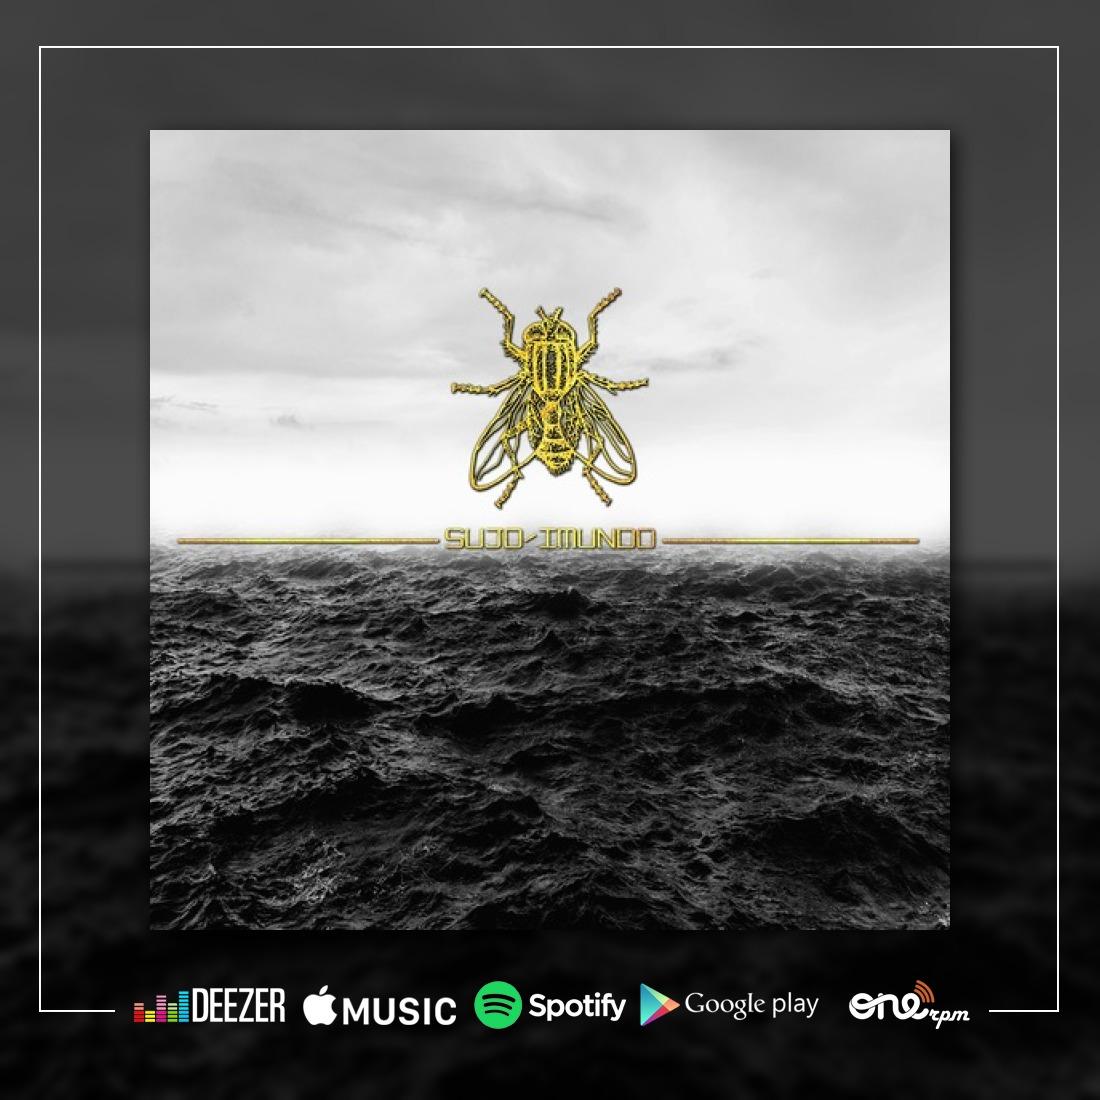 Sujo/Imundo [Digital Single] 2019